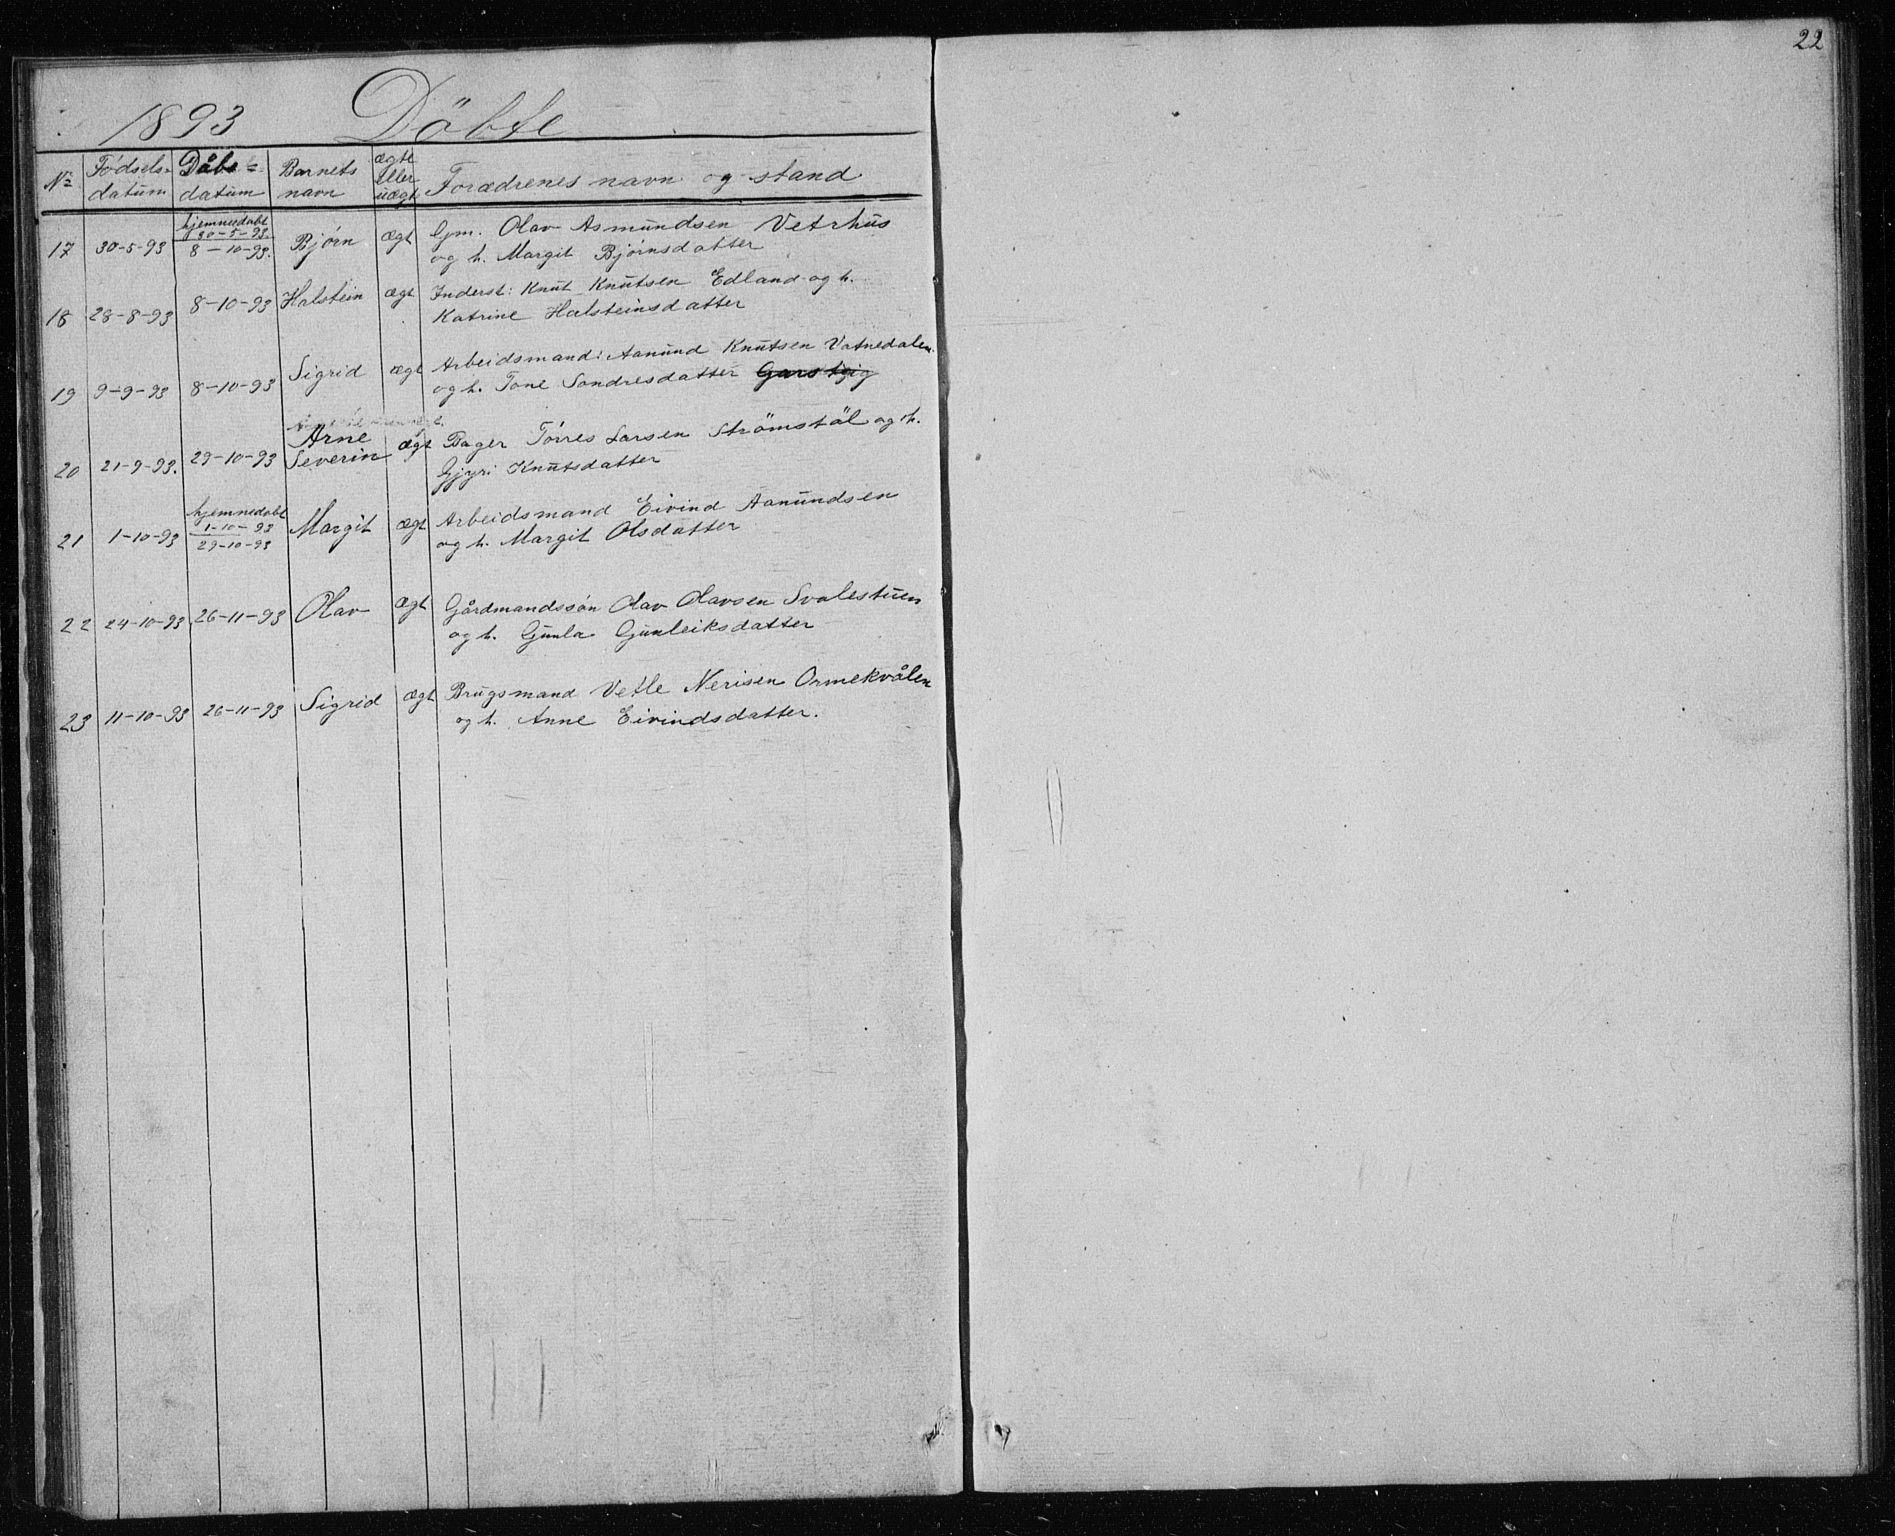 SAKO, Vinje kirkebøker, G/Gc/L0001: Klokkerbok nr. III 1, 1850-1893, s. 22